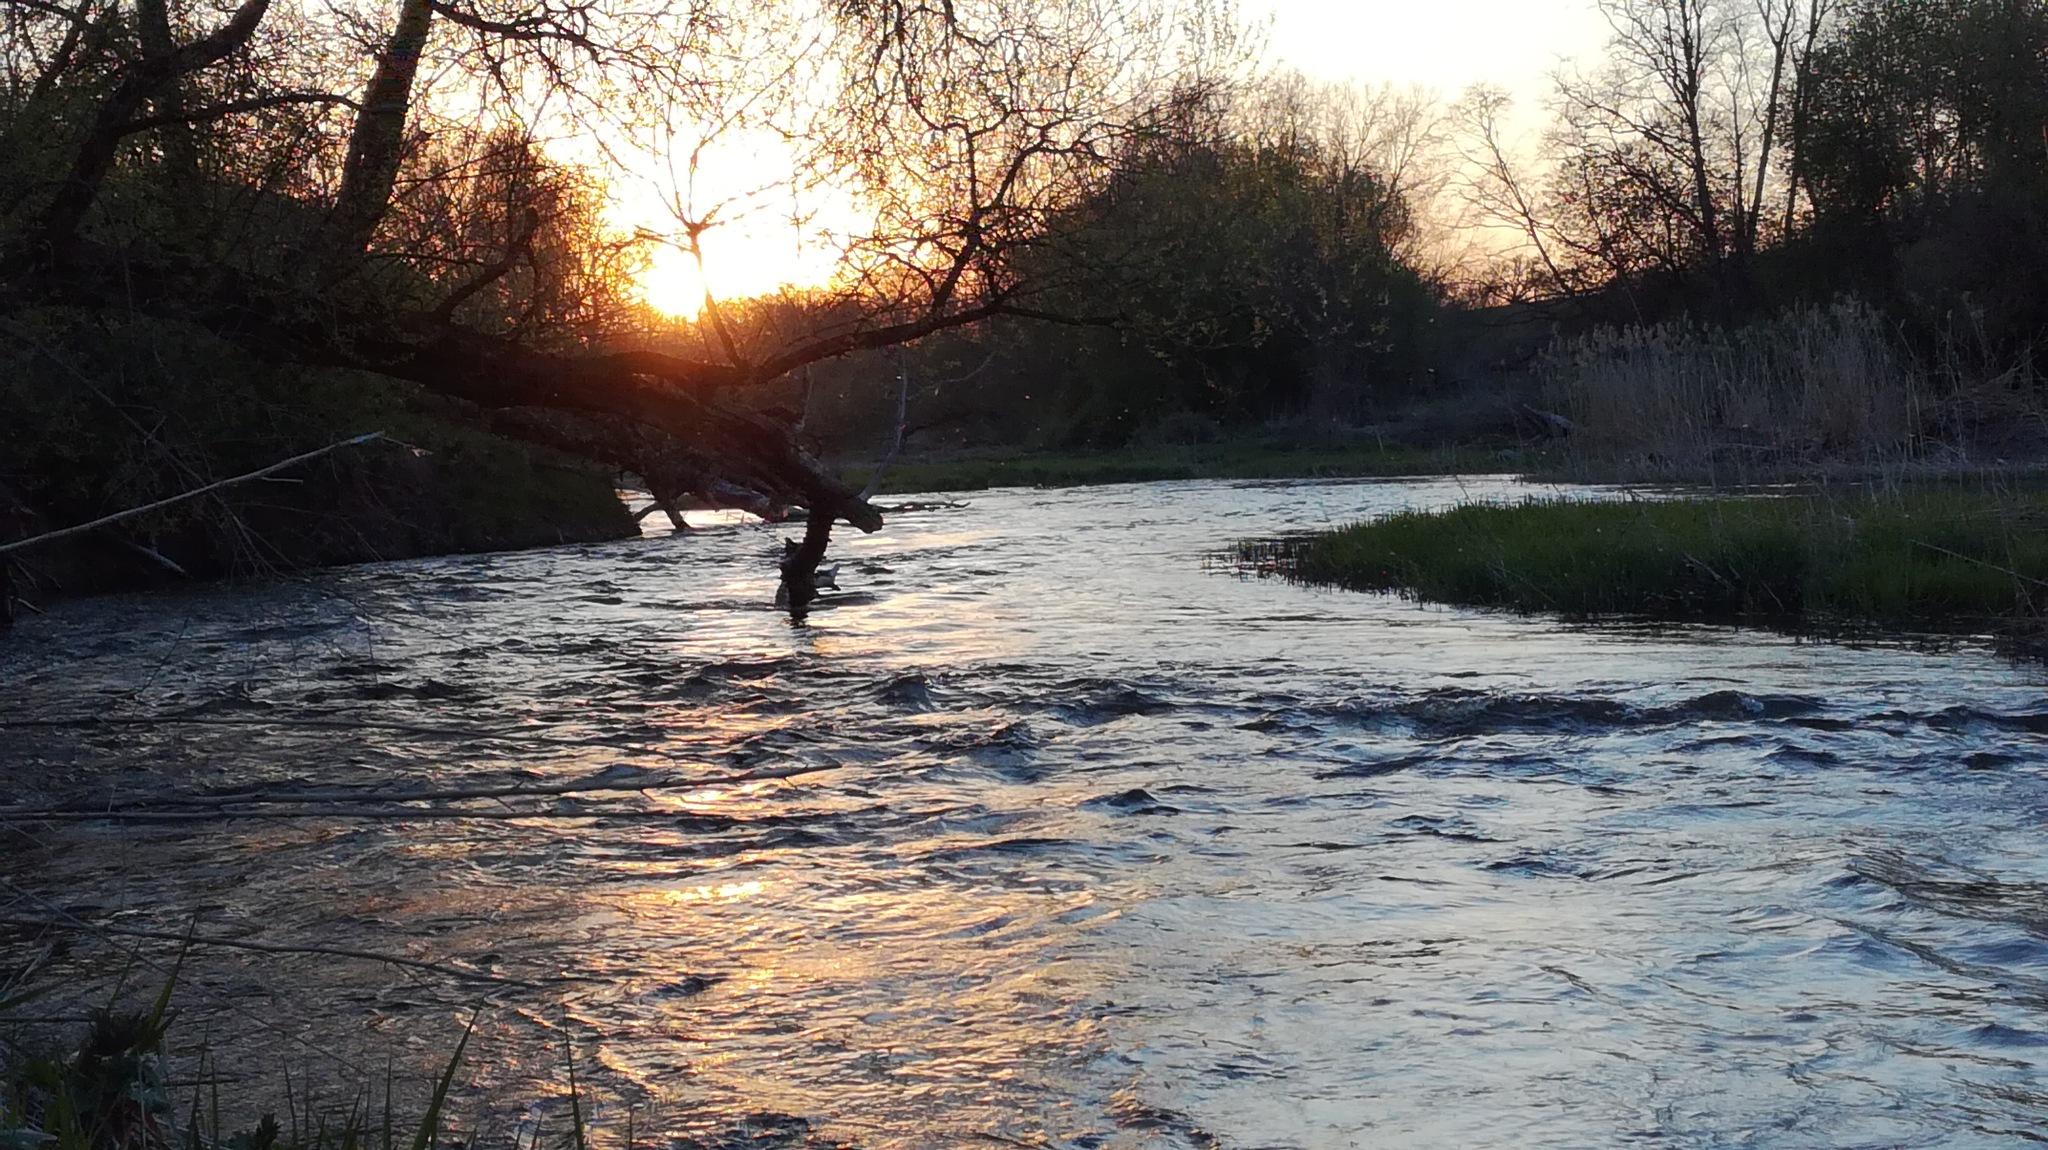 Spring evening by uzkuraitiene62